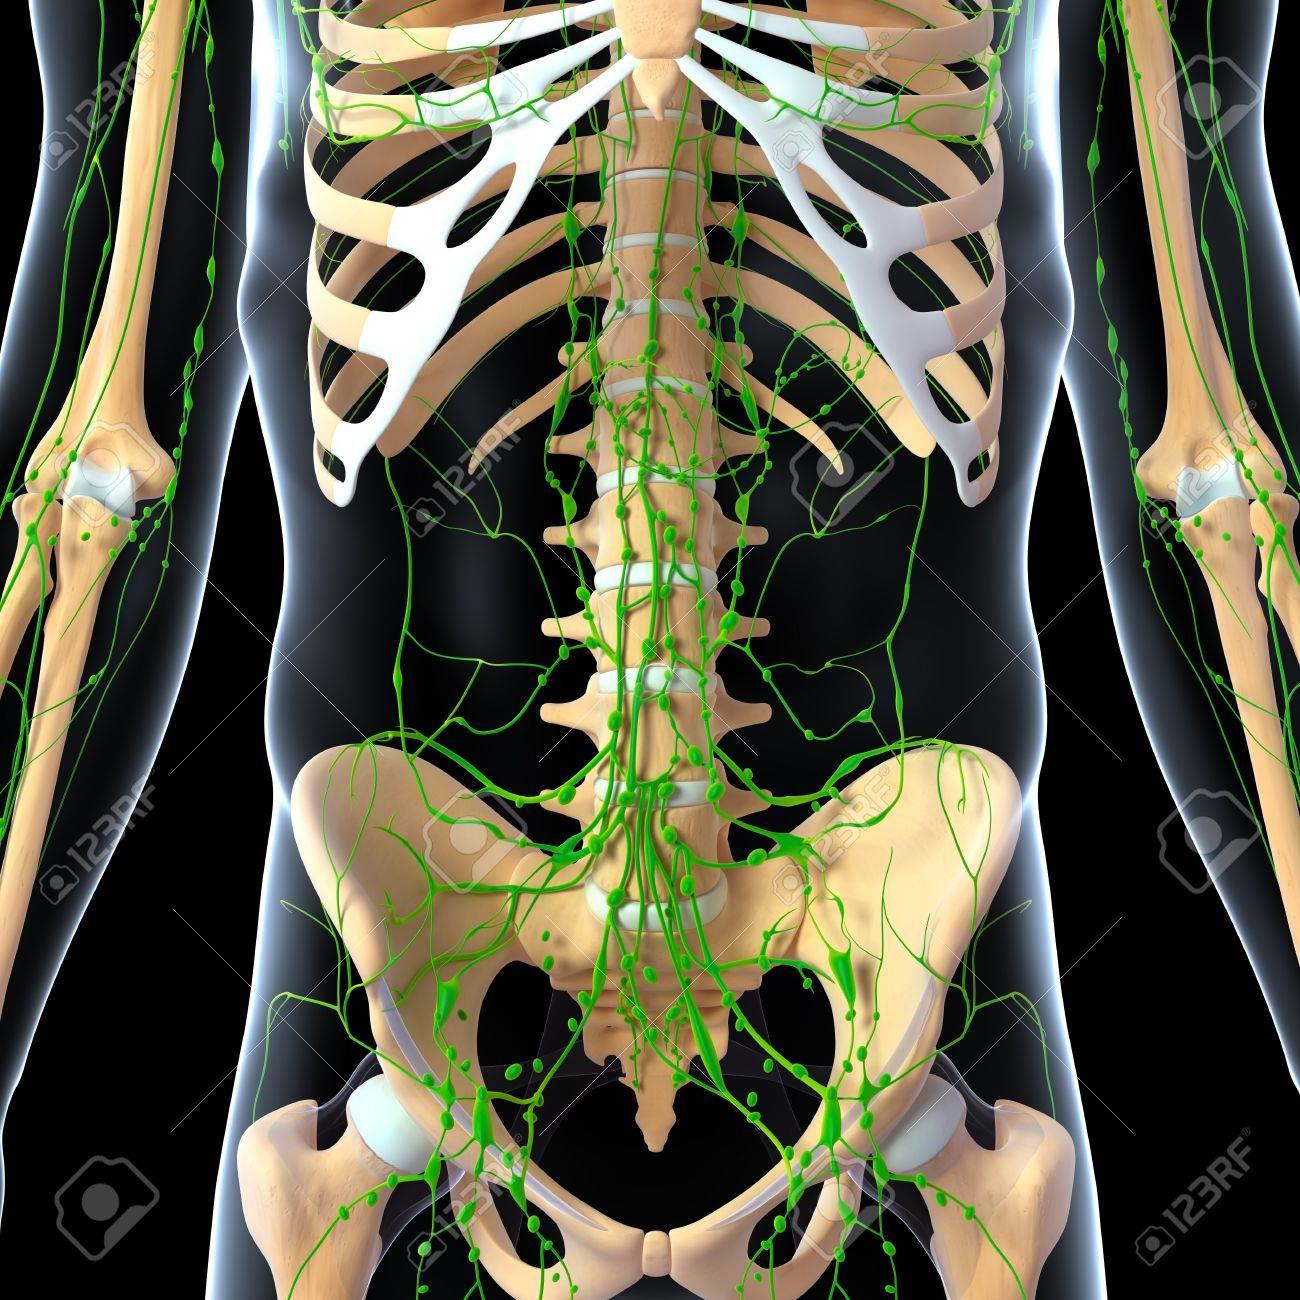 3d Art Illustration Of Lymphatic System Of Female Front Side Kidney